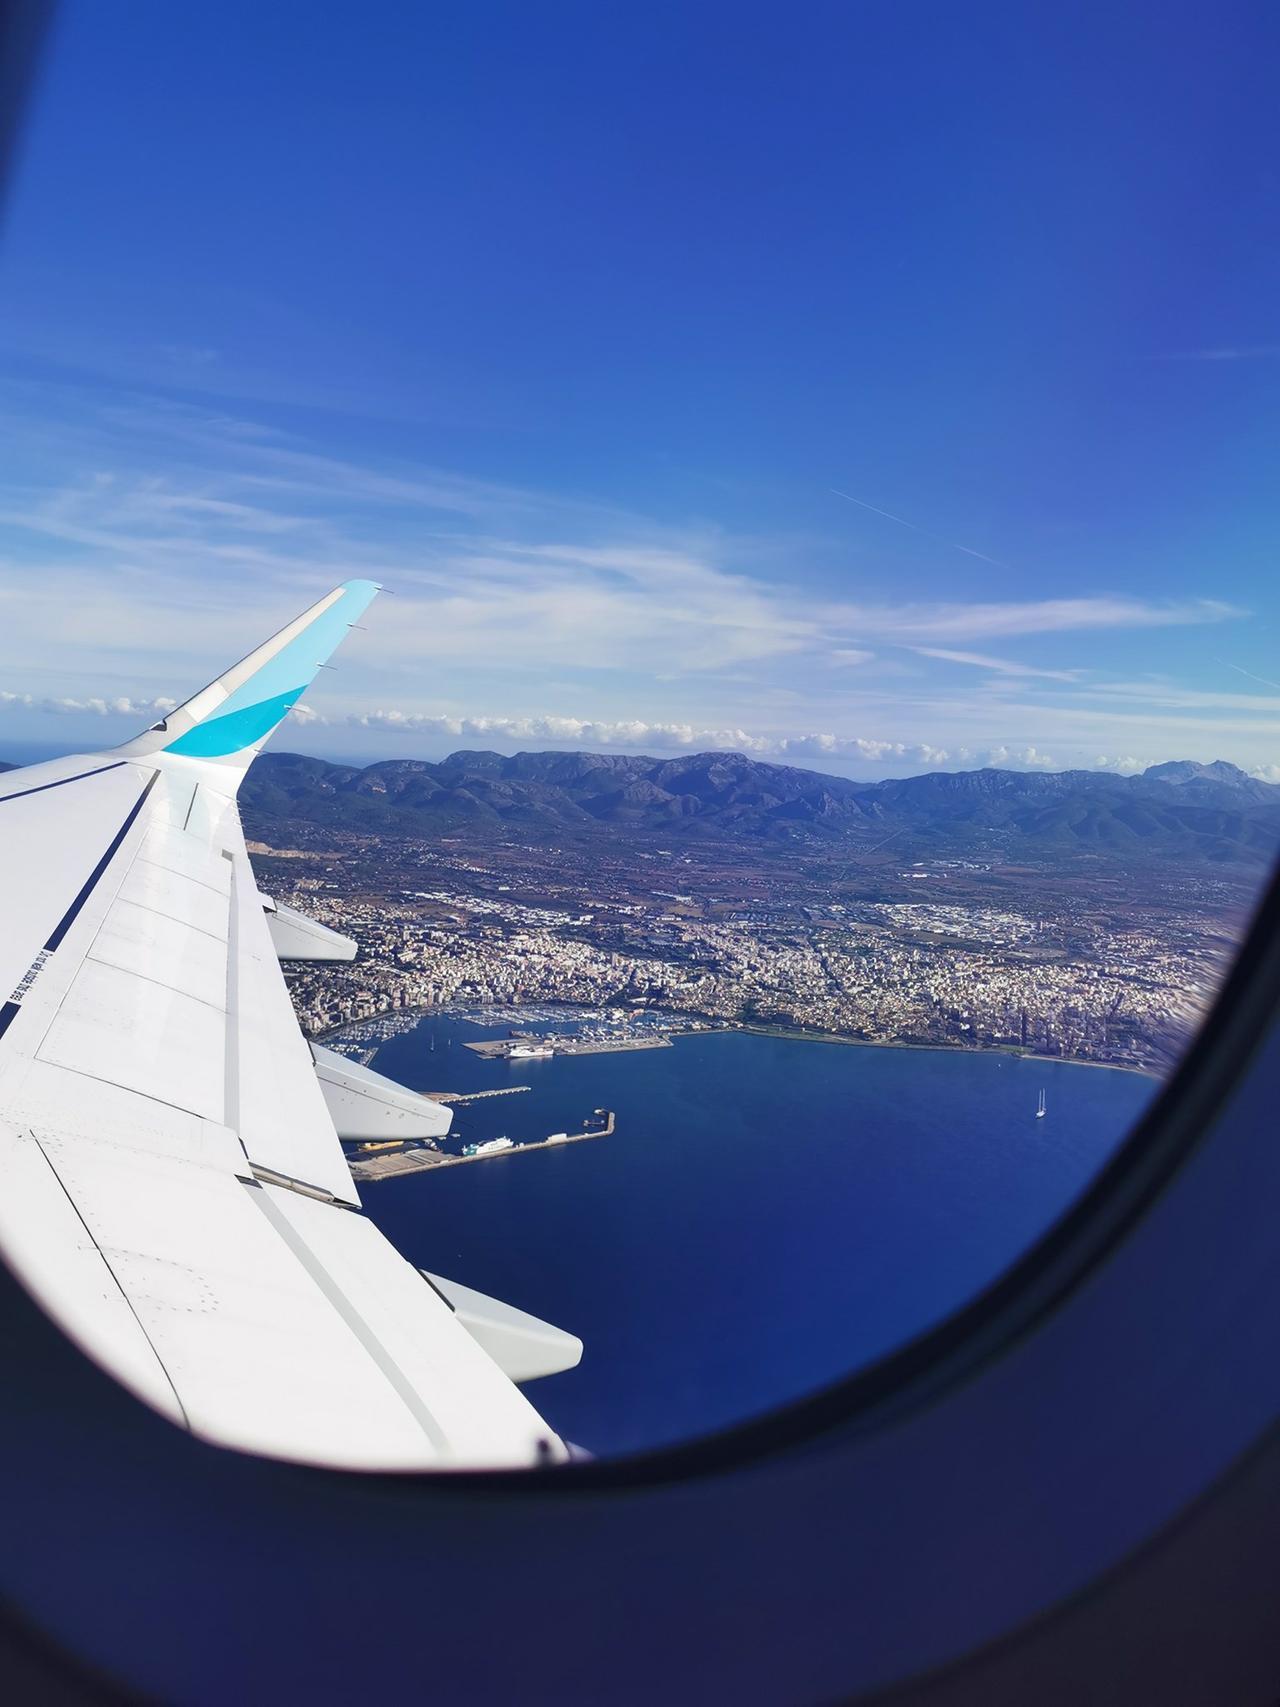 Mone flog mit Eurowings nach Mallorca.